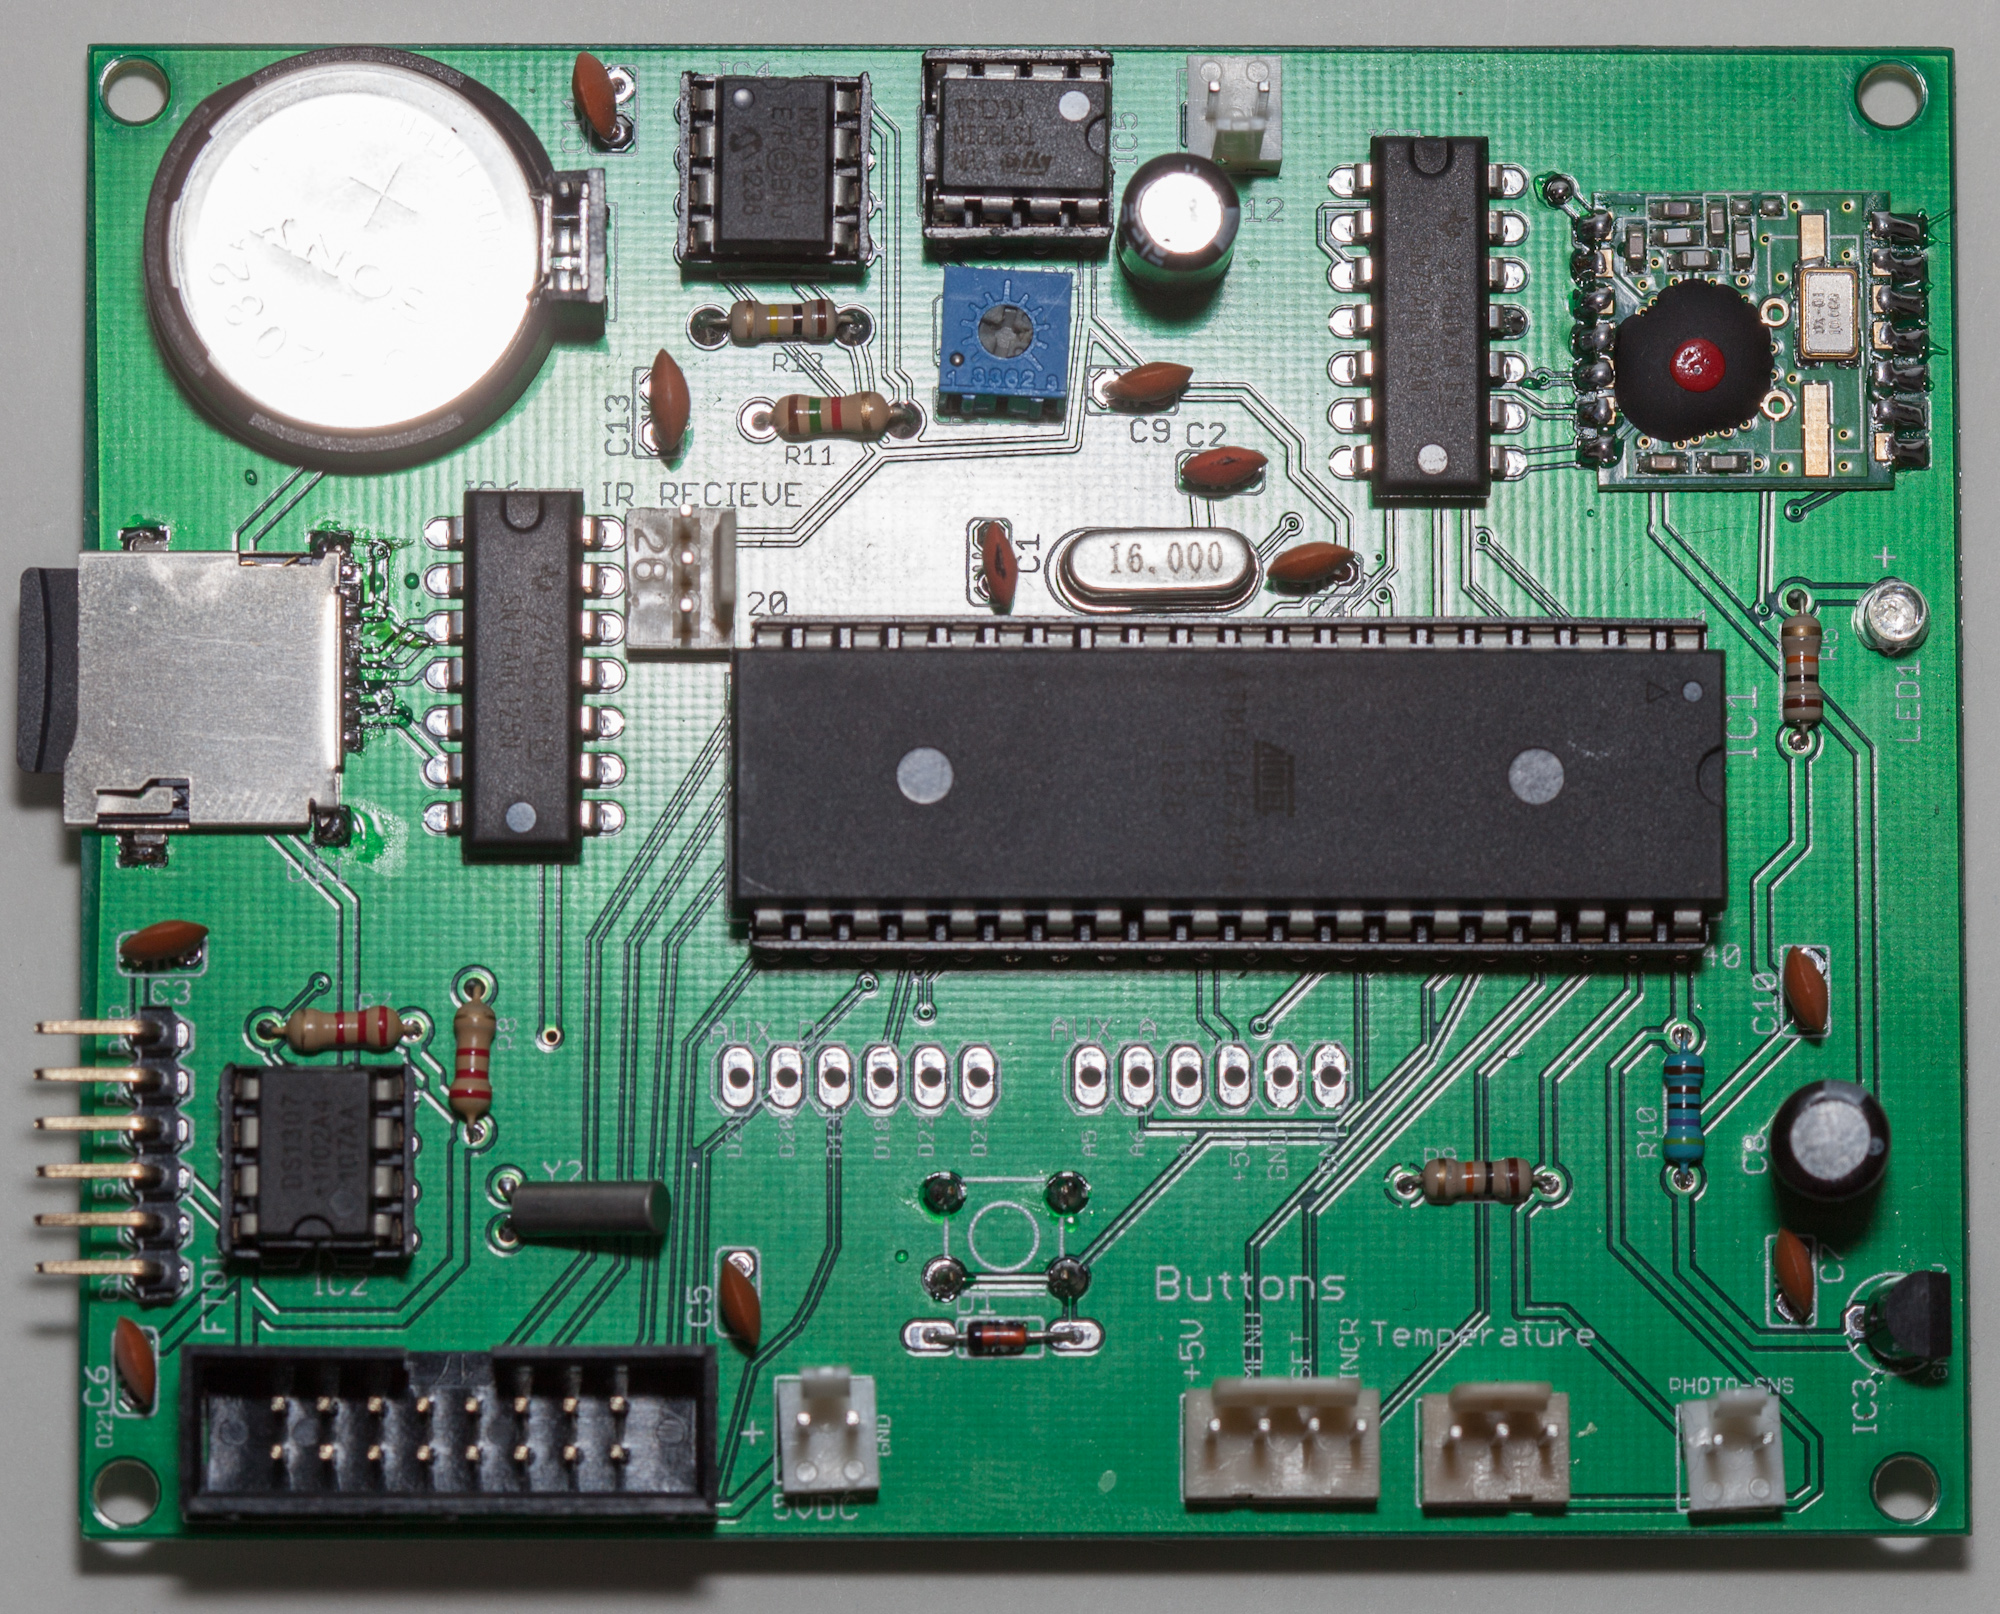 PCB V2.0